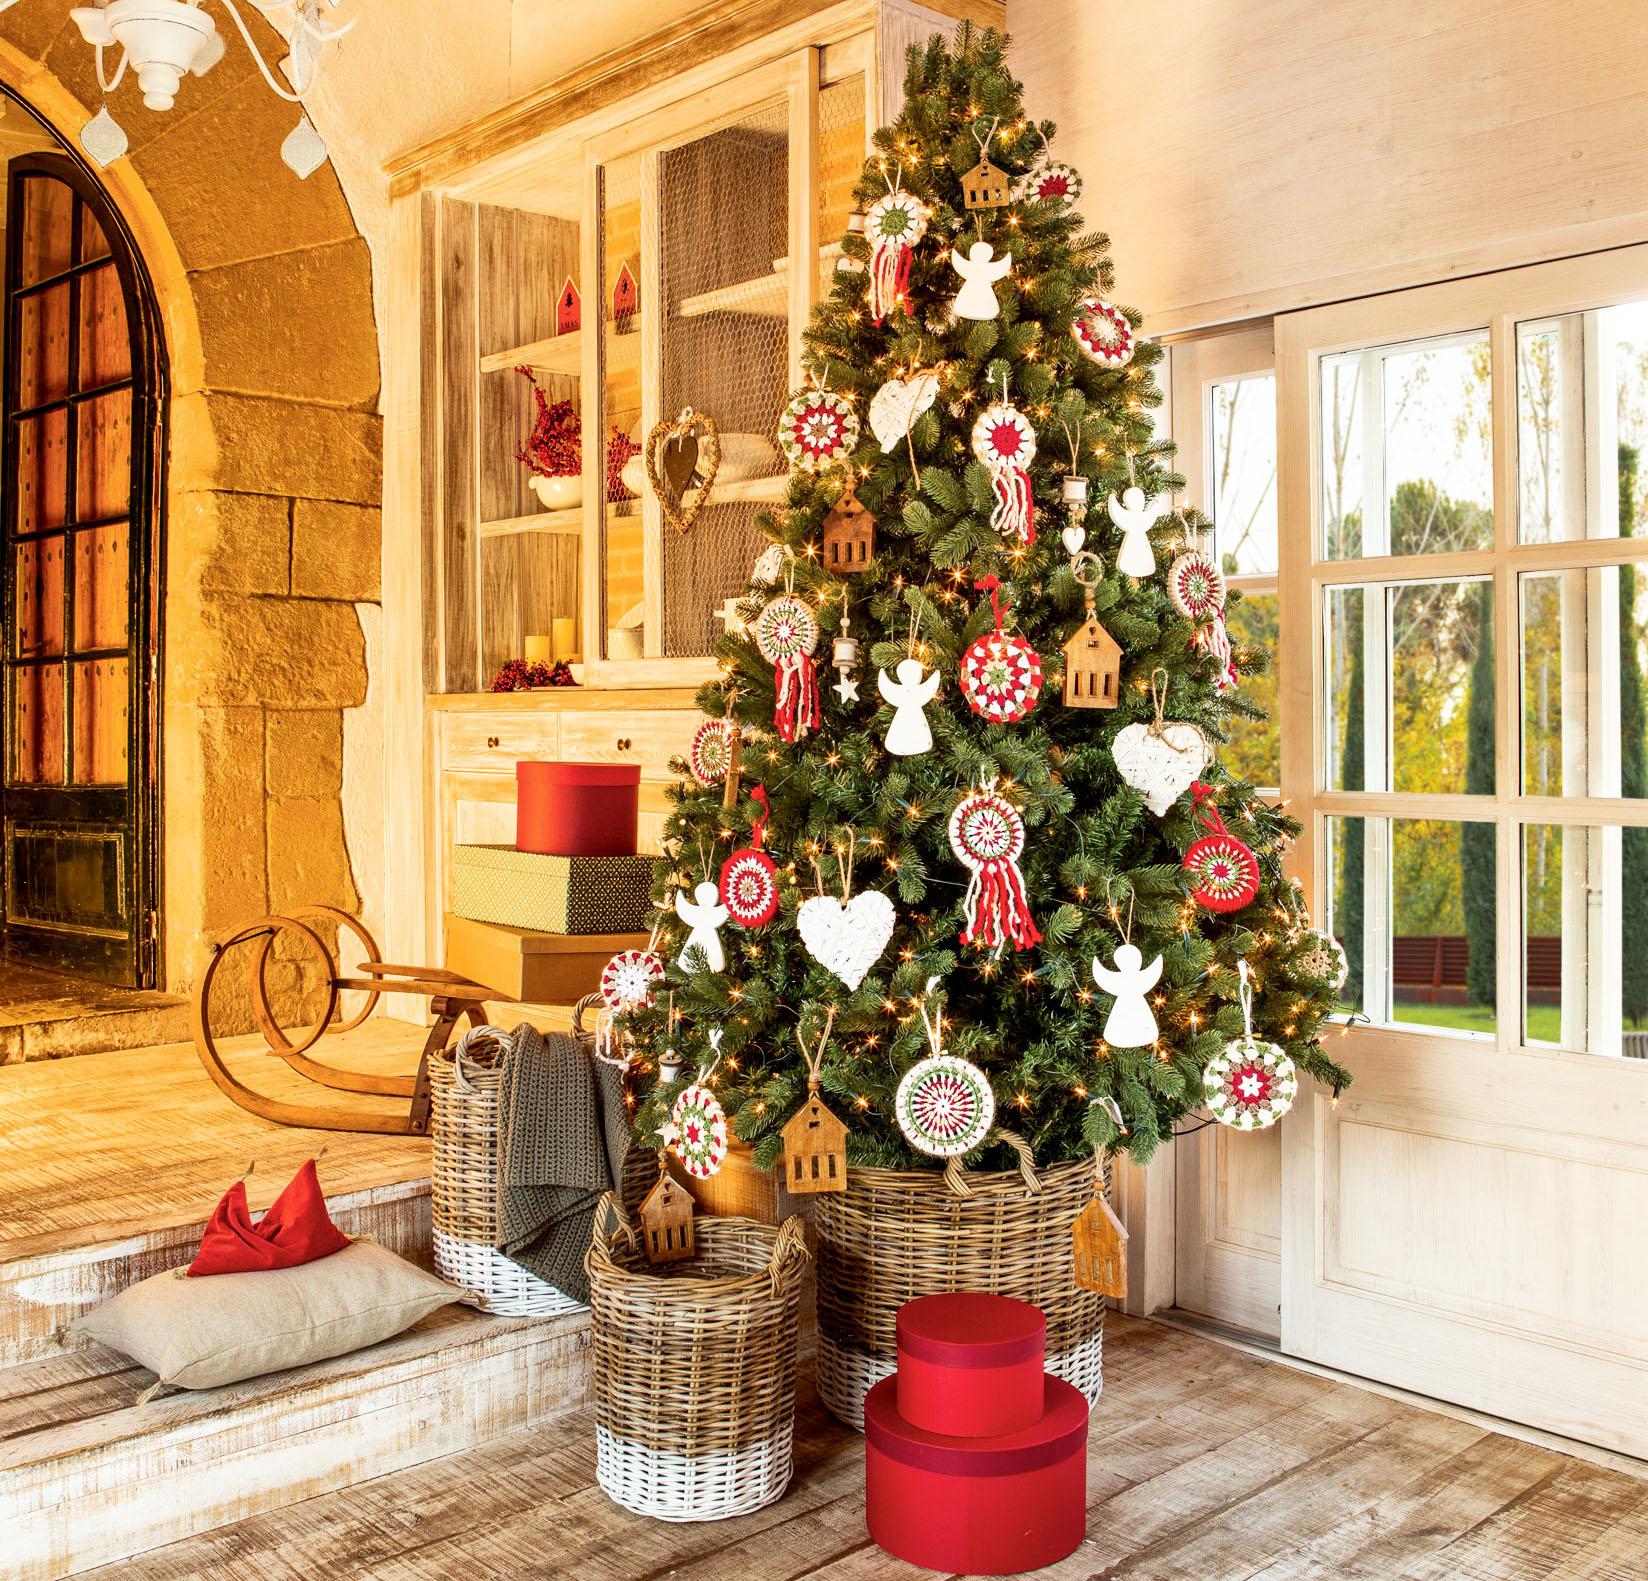 Rboles De Navidad Adornos E Ideas De Decoraci N Elmueble